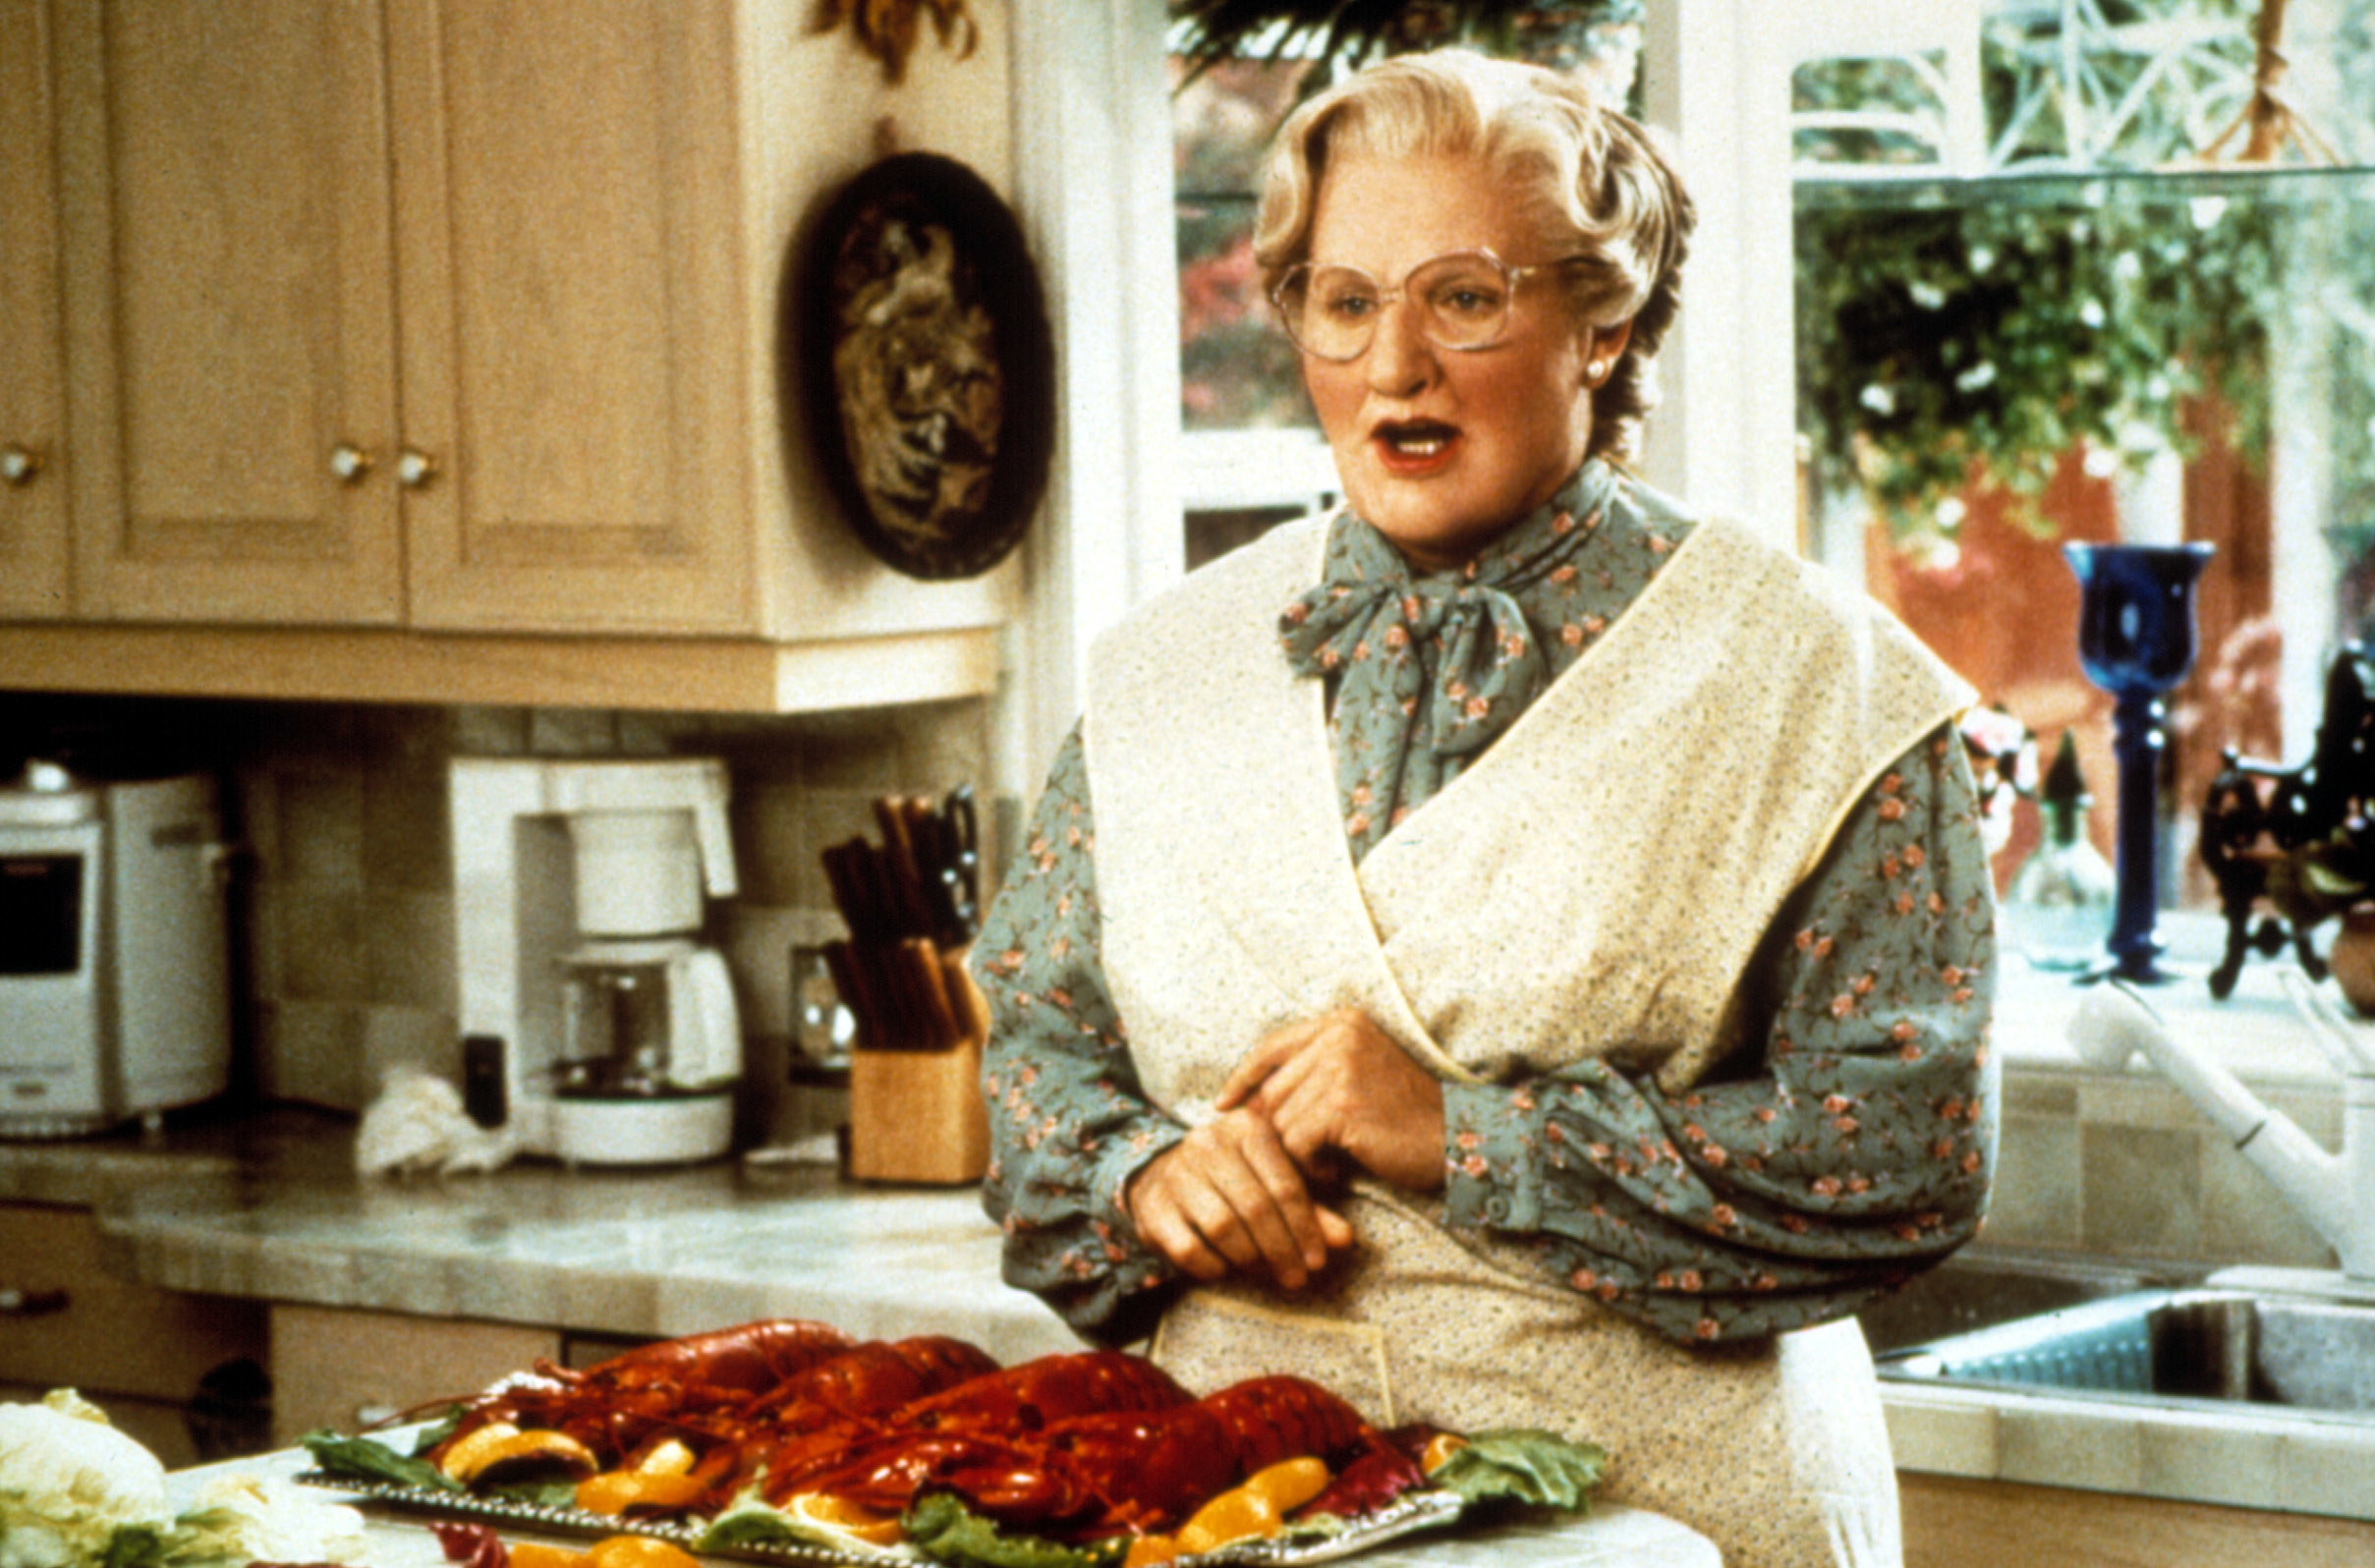 Mrs. Doubtfire dressed as a woman